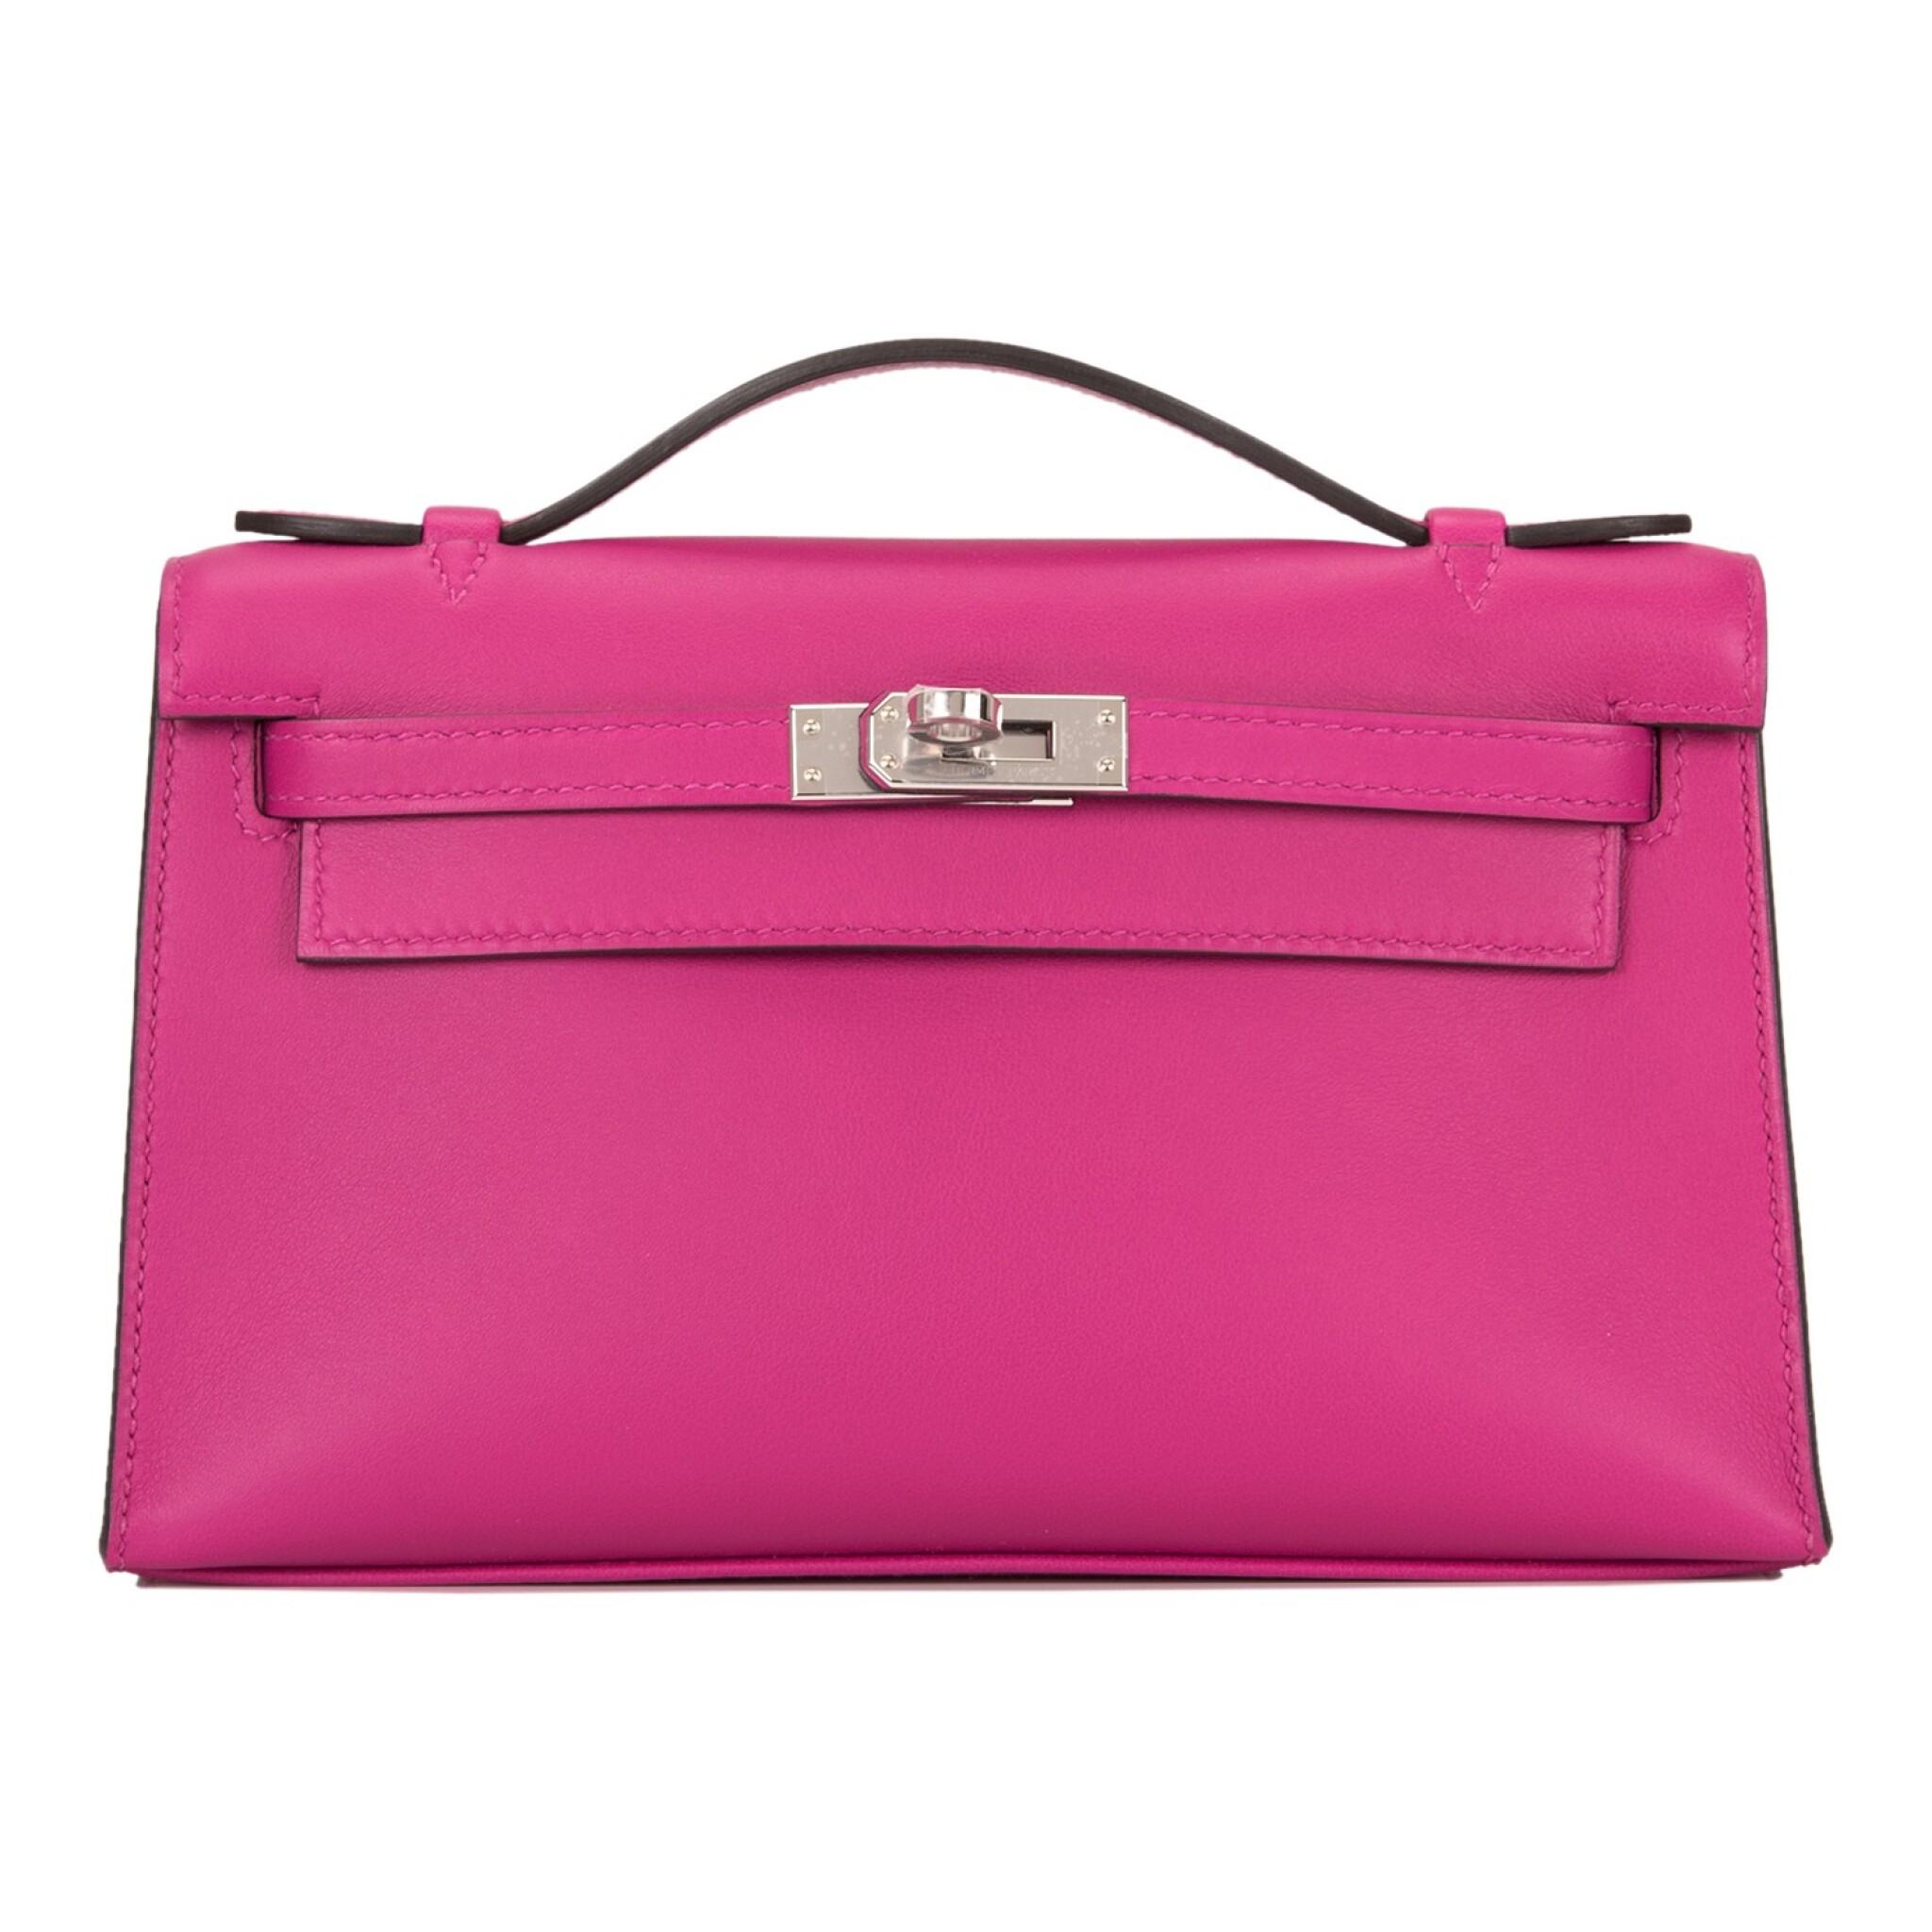 View full screen - View 1 of Lot 15. Hermès Rose Pourpre Swift Mini Kelly Pochette.